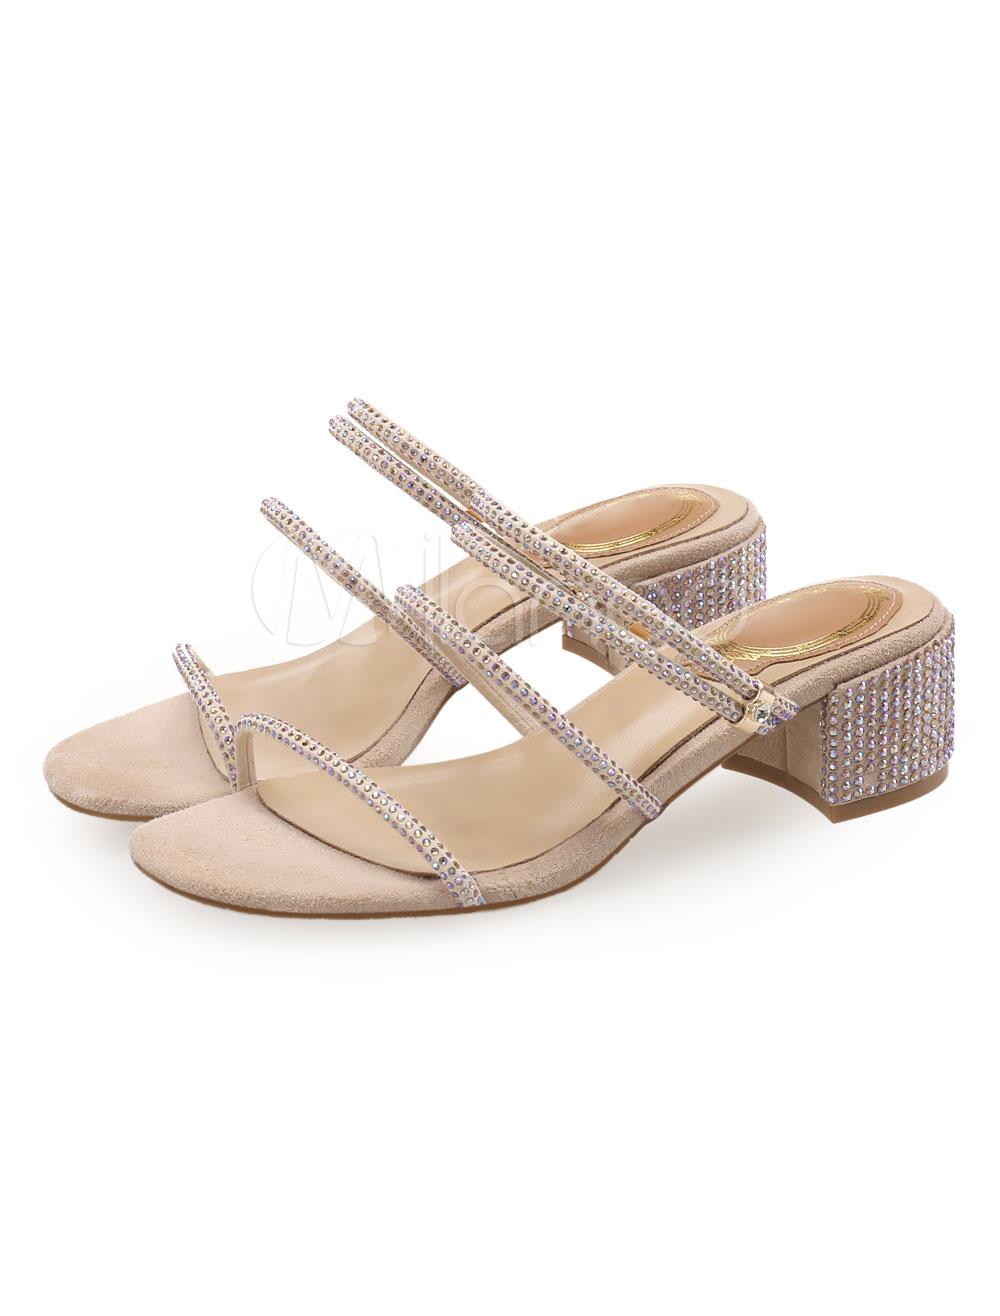 03951df2c09a Block Heel Sandals Apricot Open Toe Rhinestones Strappy Sandal Shoes ...